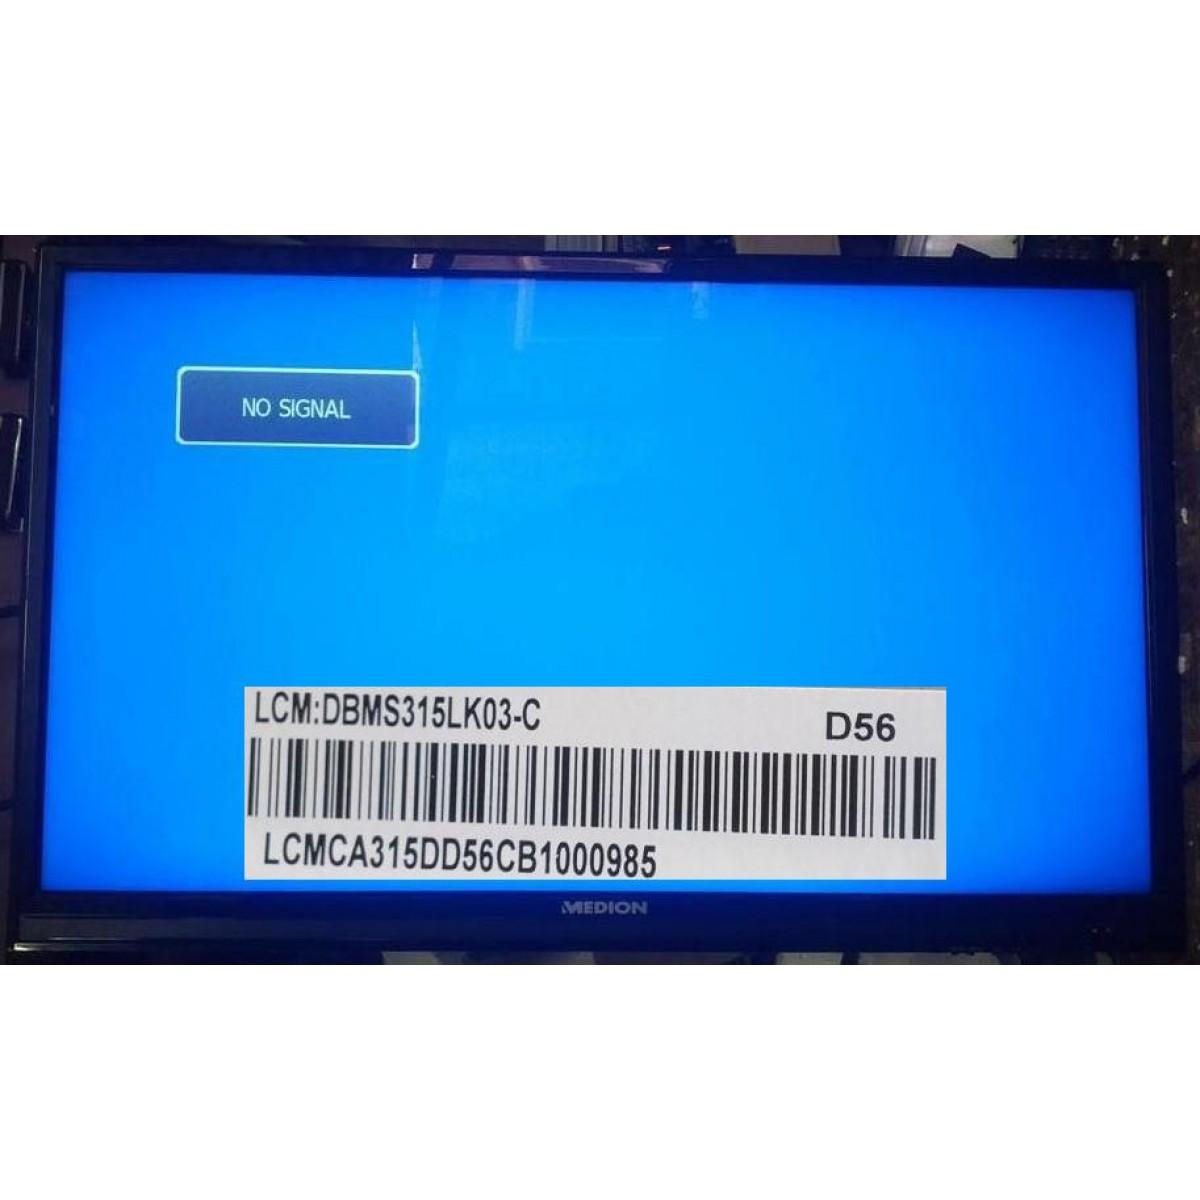 Medion Md30612aus T Con Board V460hj1 C01 Mv 0e88441 Chimei Innolux Samsung Ua65ks9000kpxd Led Tv 65 Inch